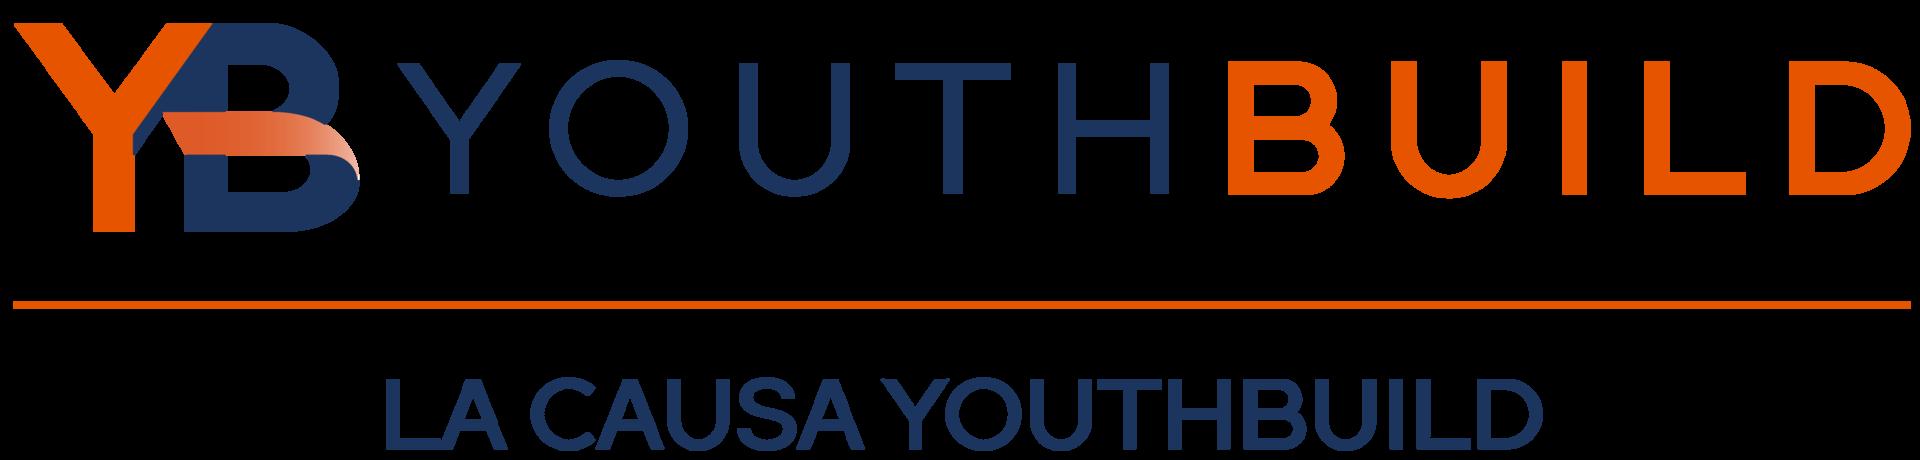 LA CAUSA YouthBuild logo